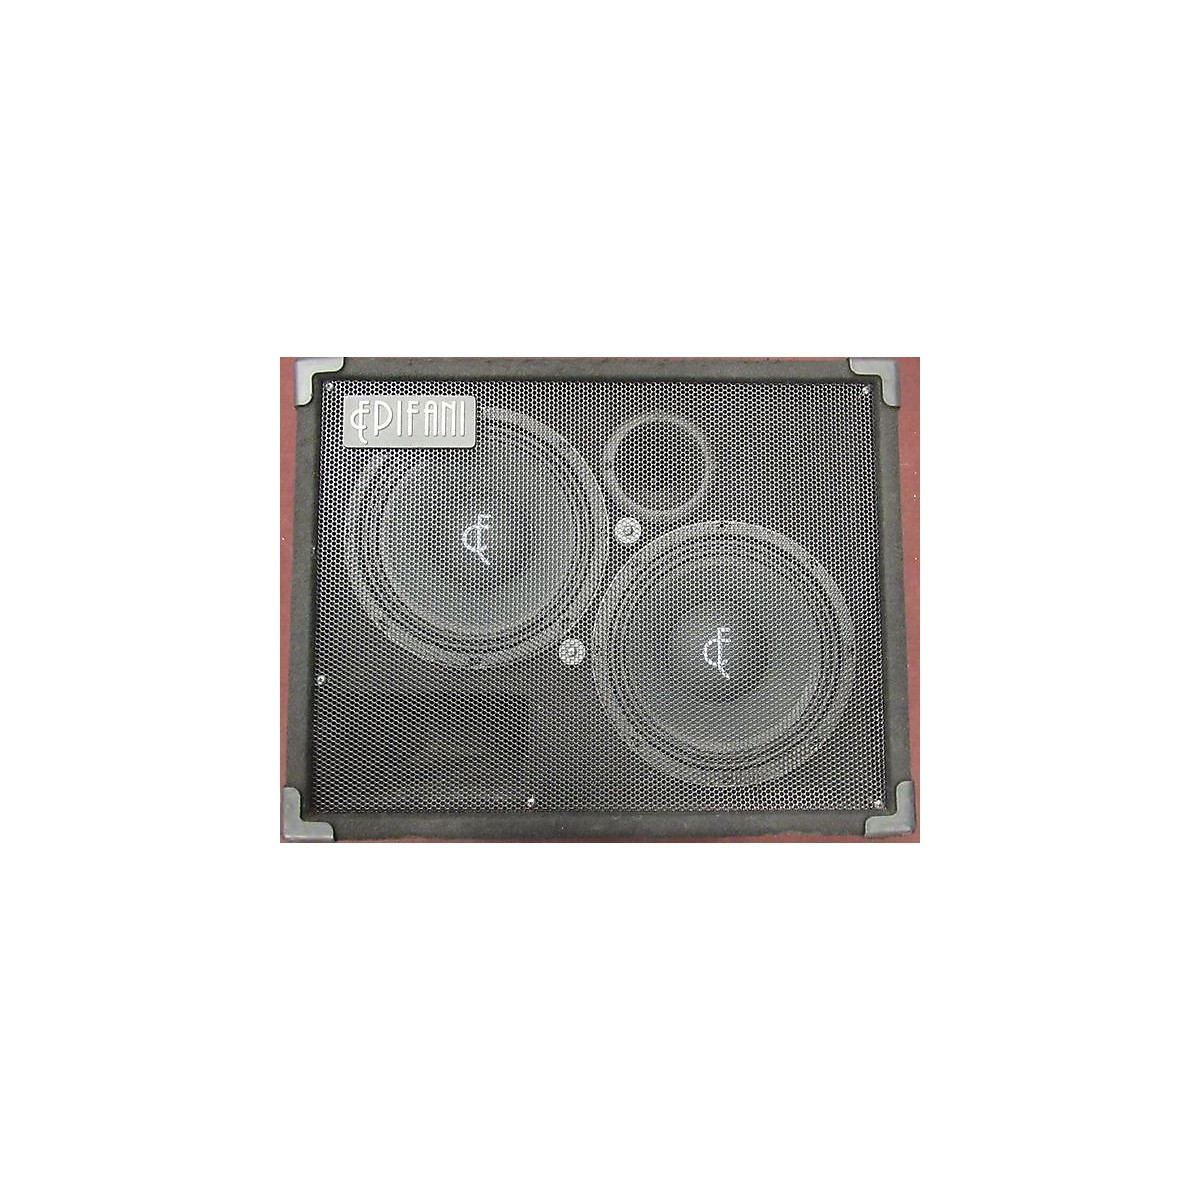 Epifani DIST UI-210 SERIES 3 Bass Cabinet